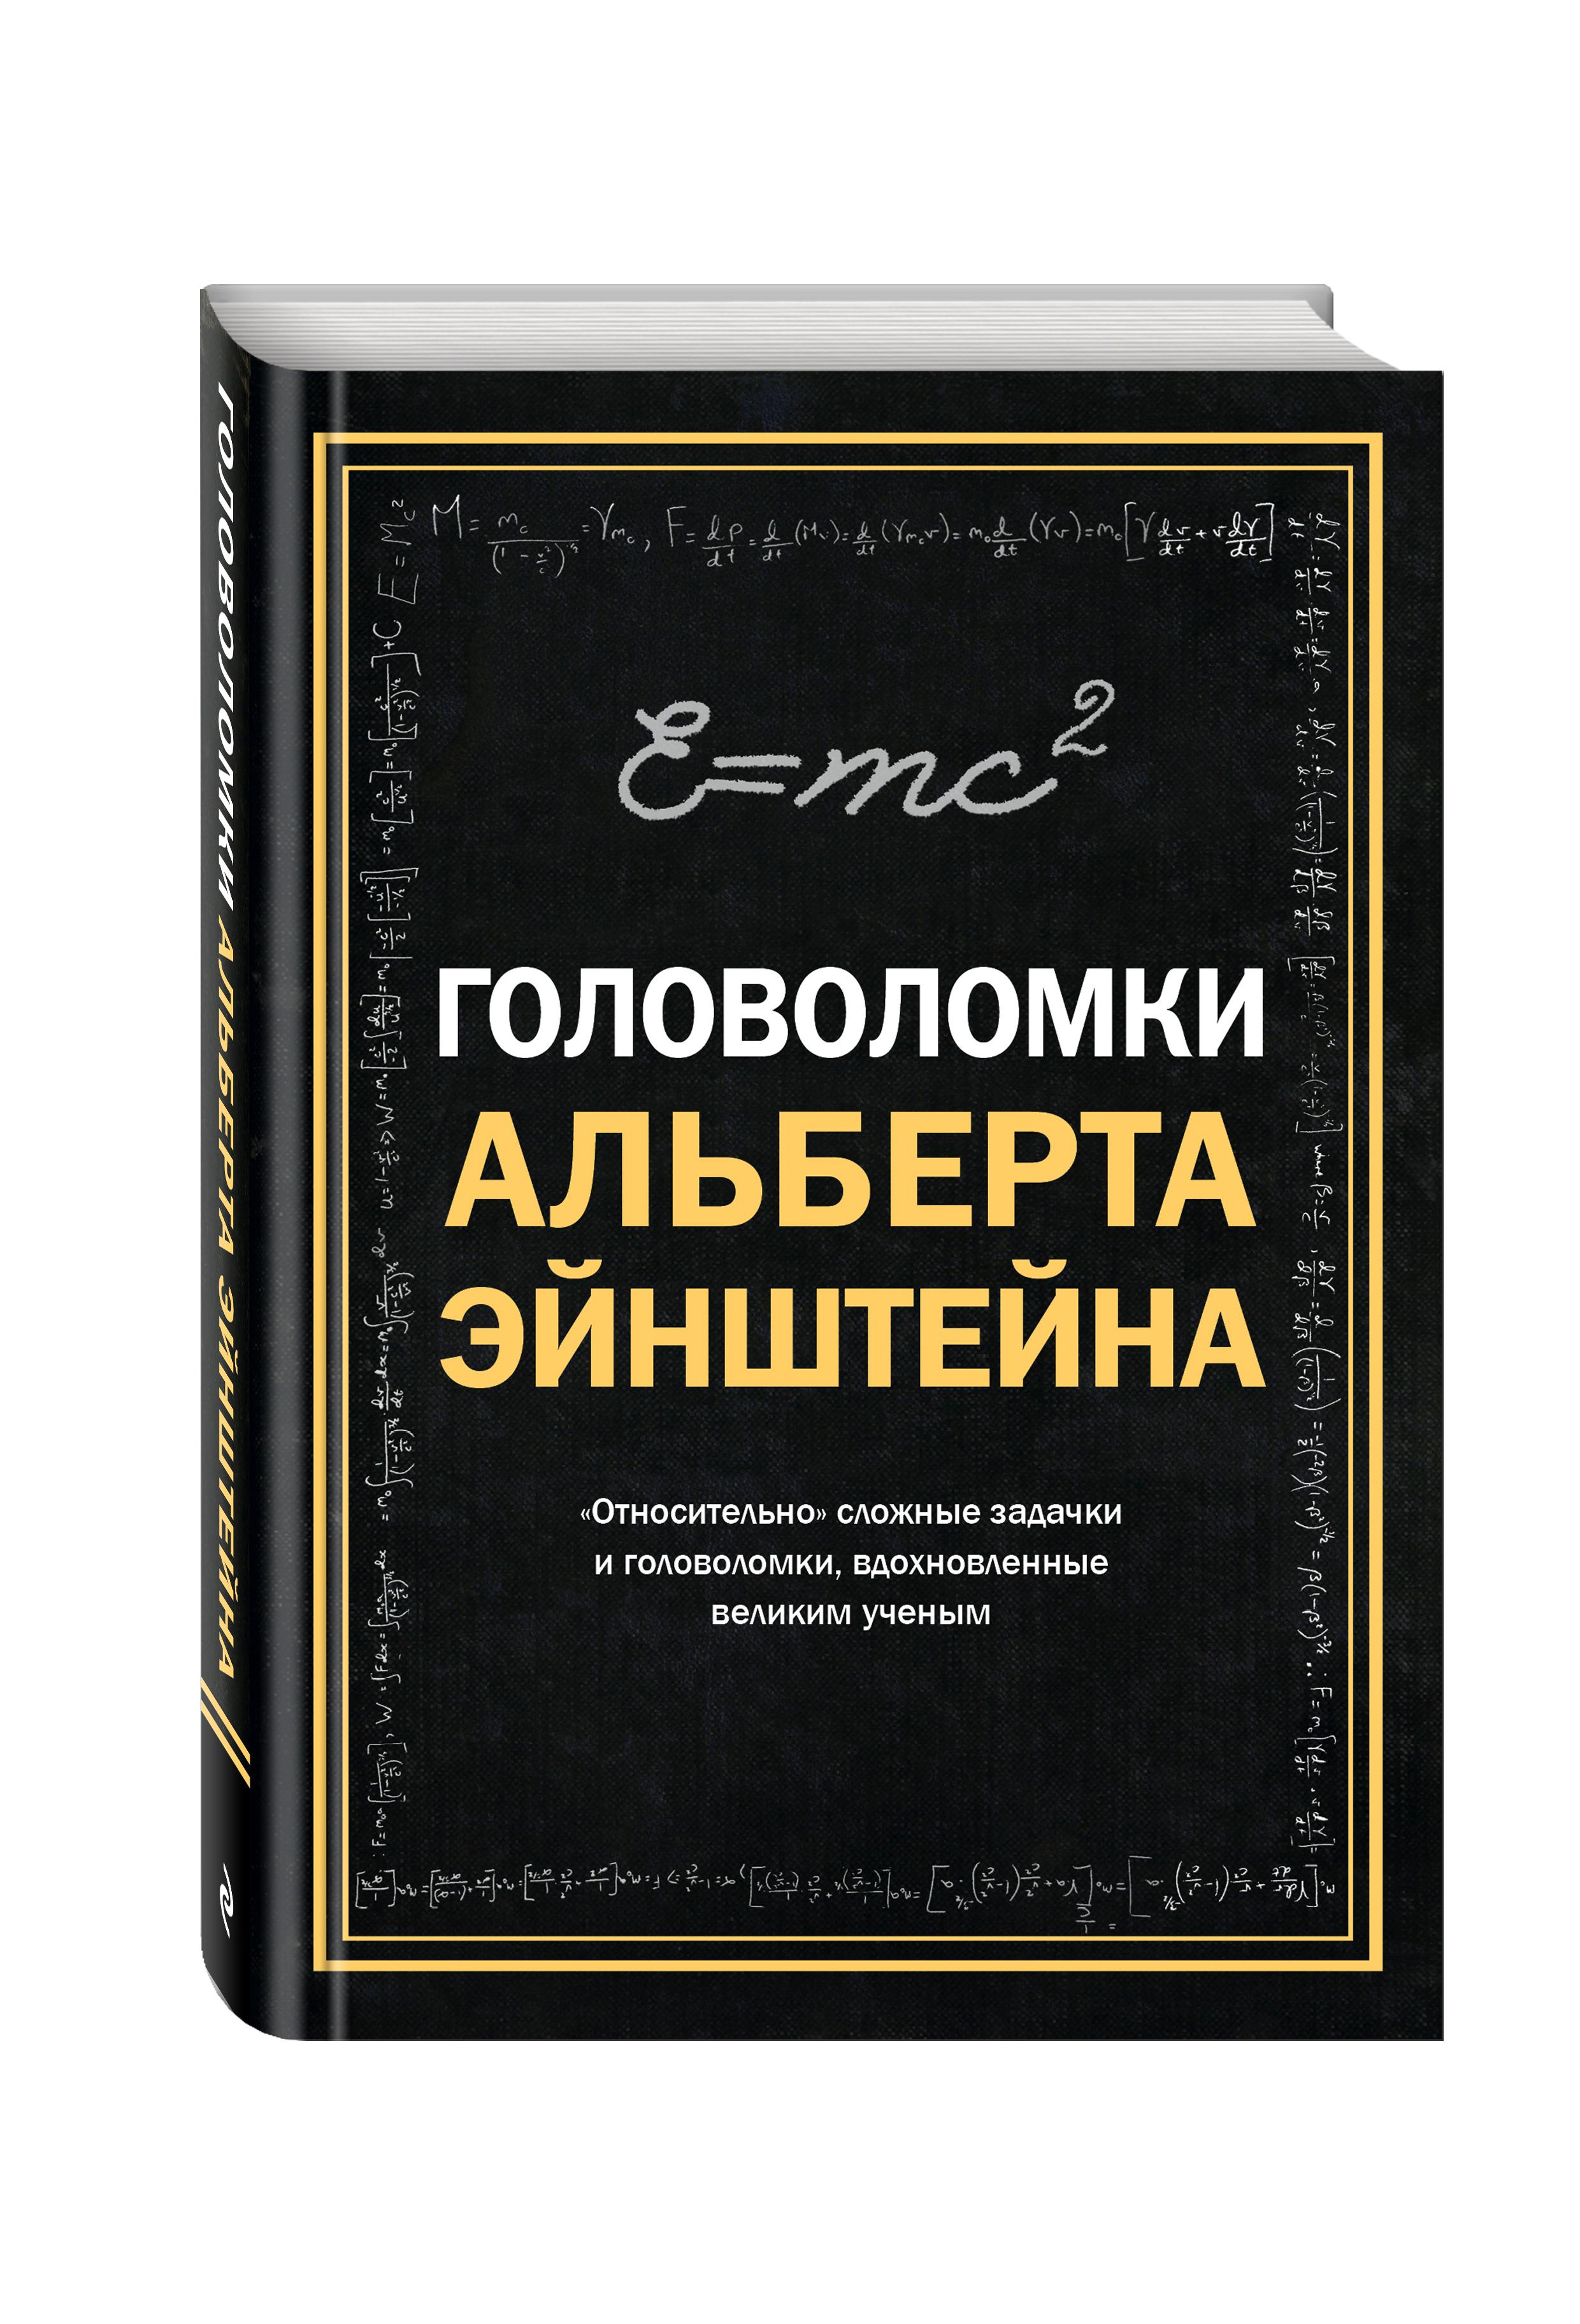 Головоломки Альберта Эйнштейна